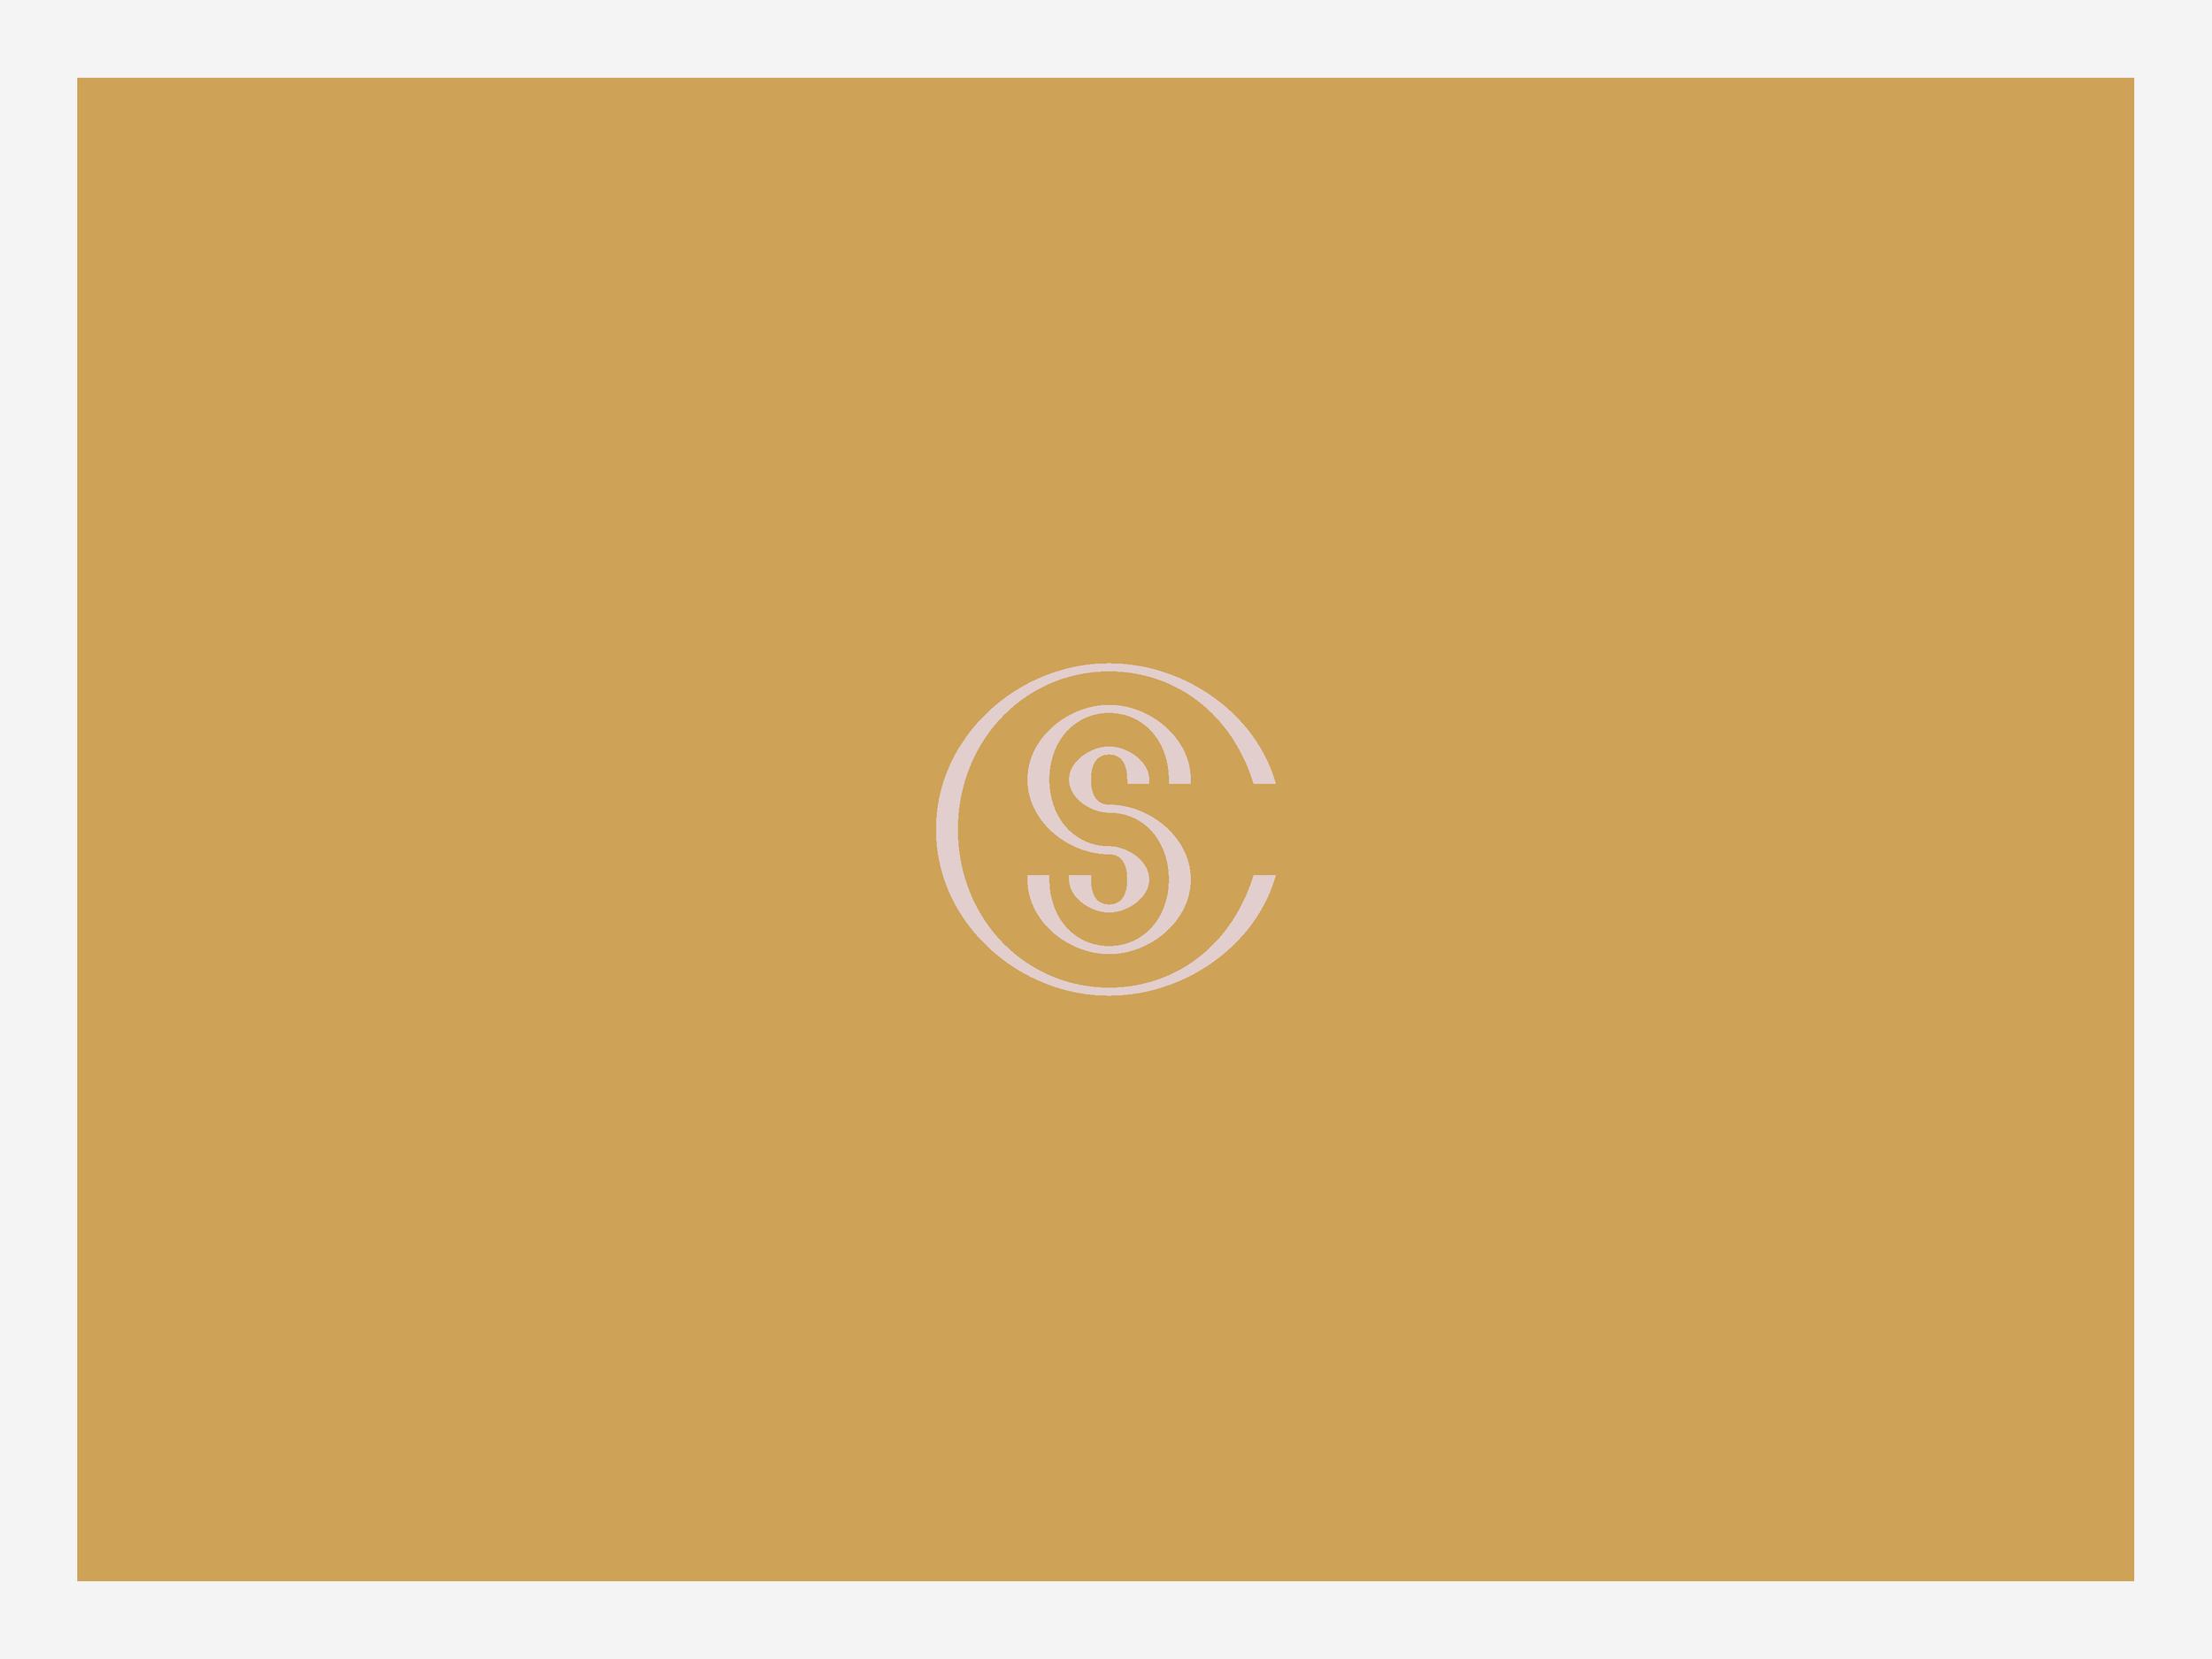 30 Spruce Street Commons Monogram logo.png